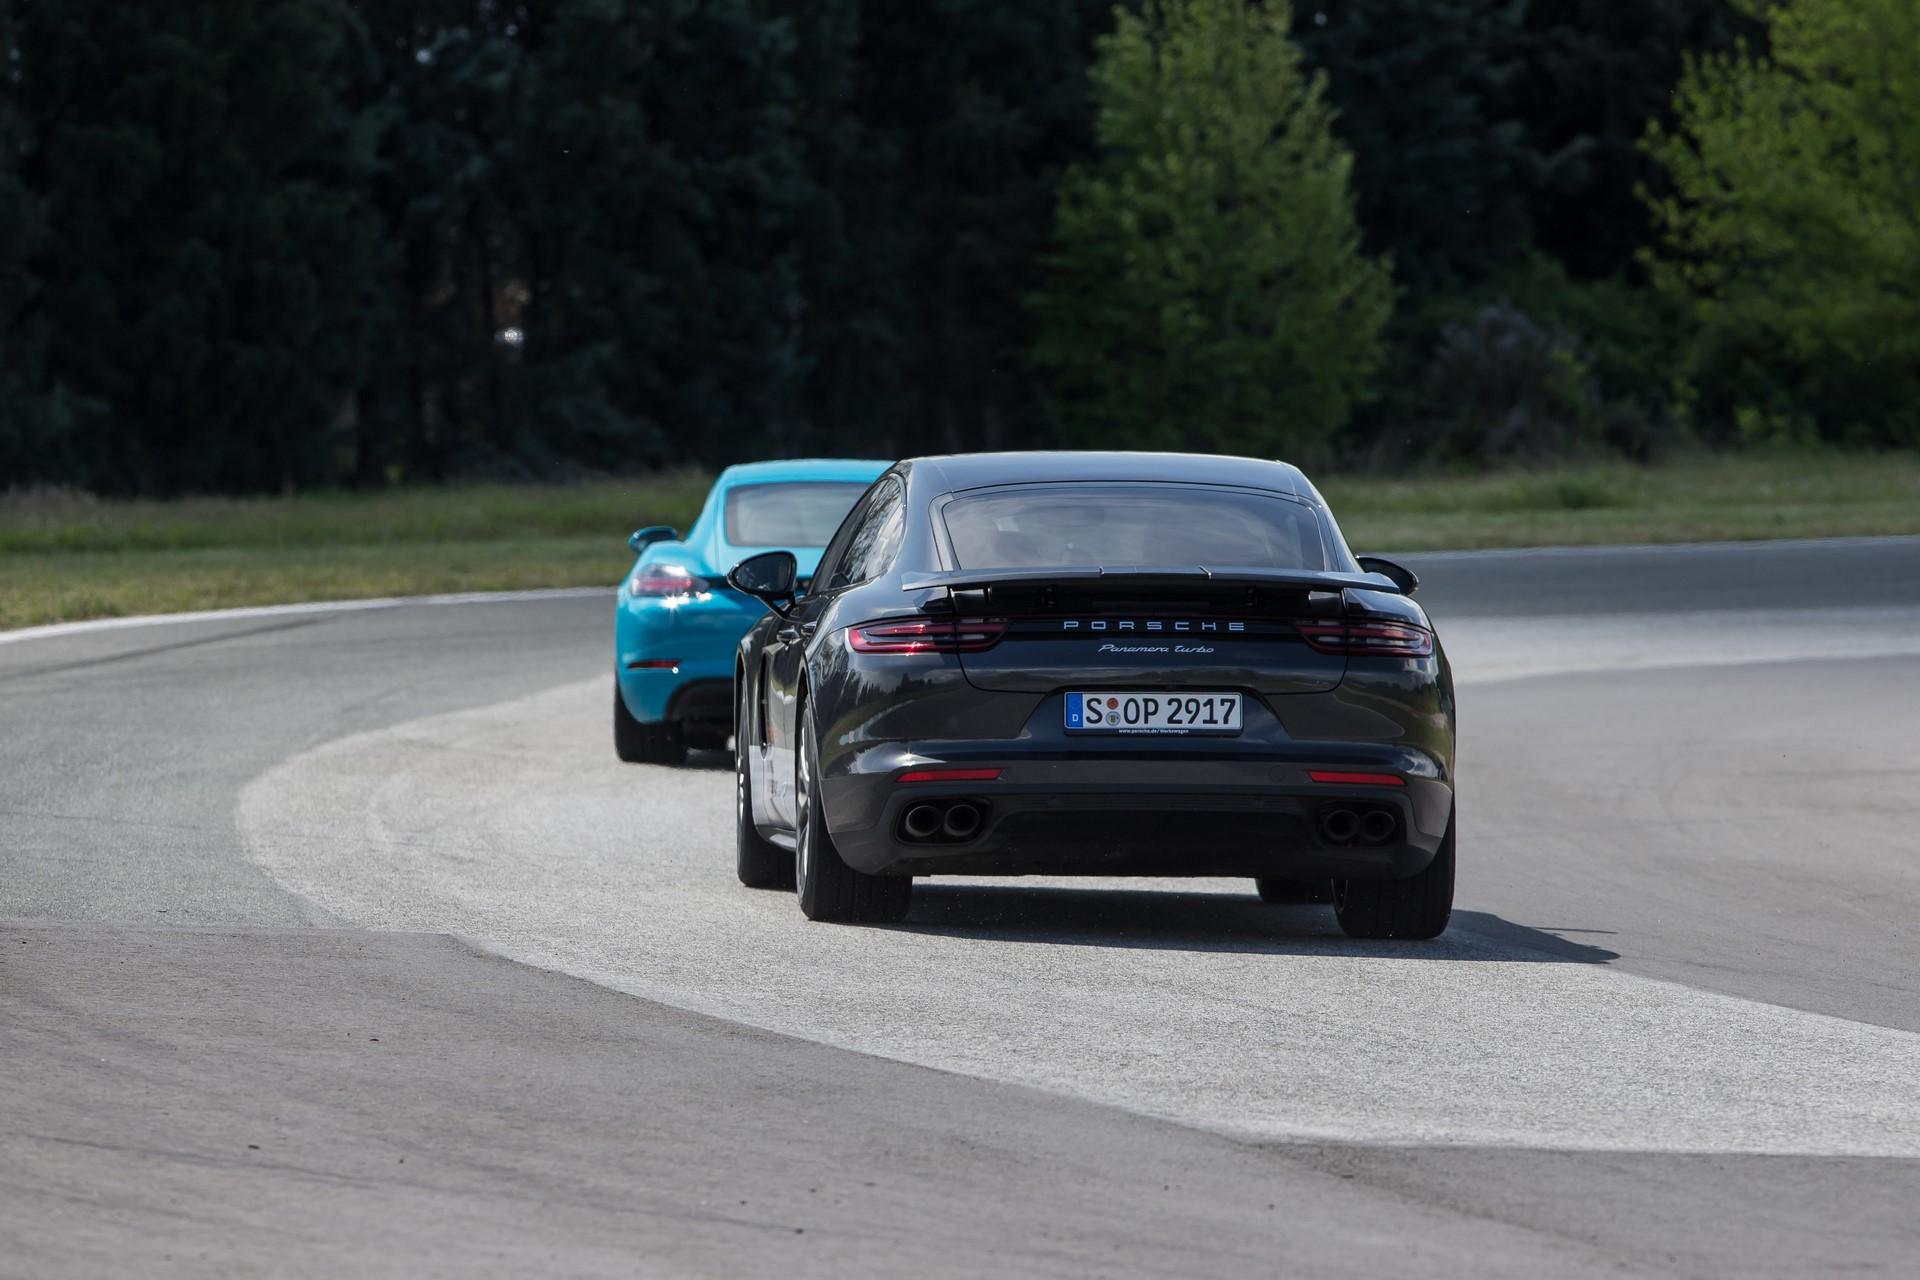 Porsche Driving Experience 2017 Serres (69)